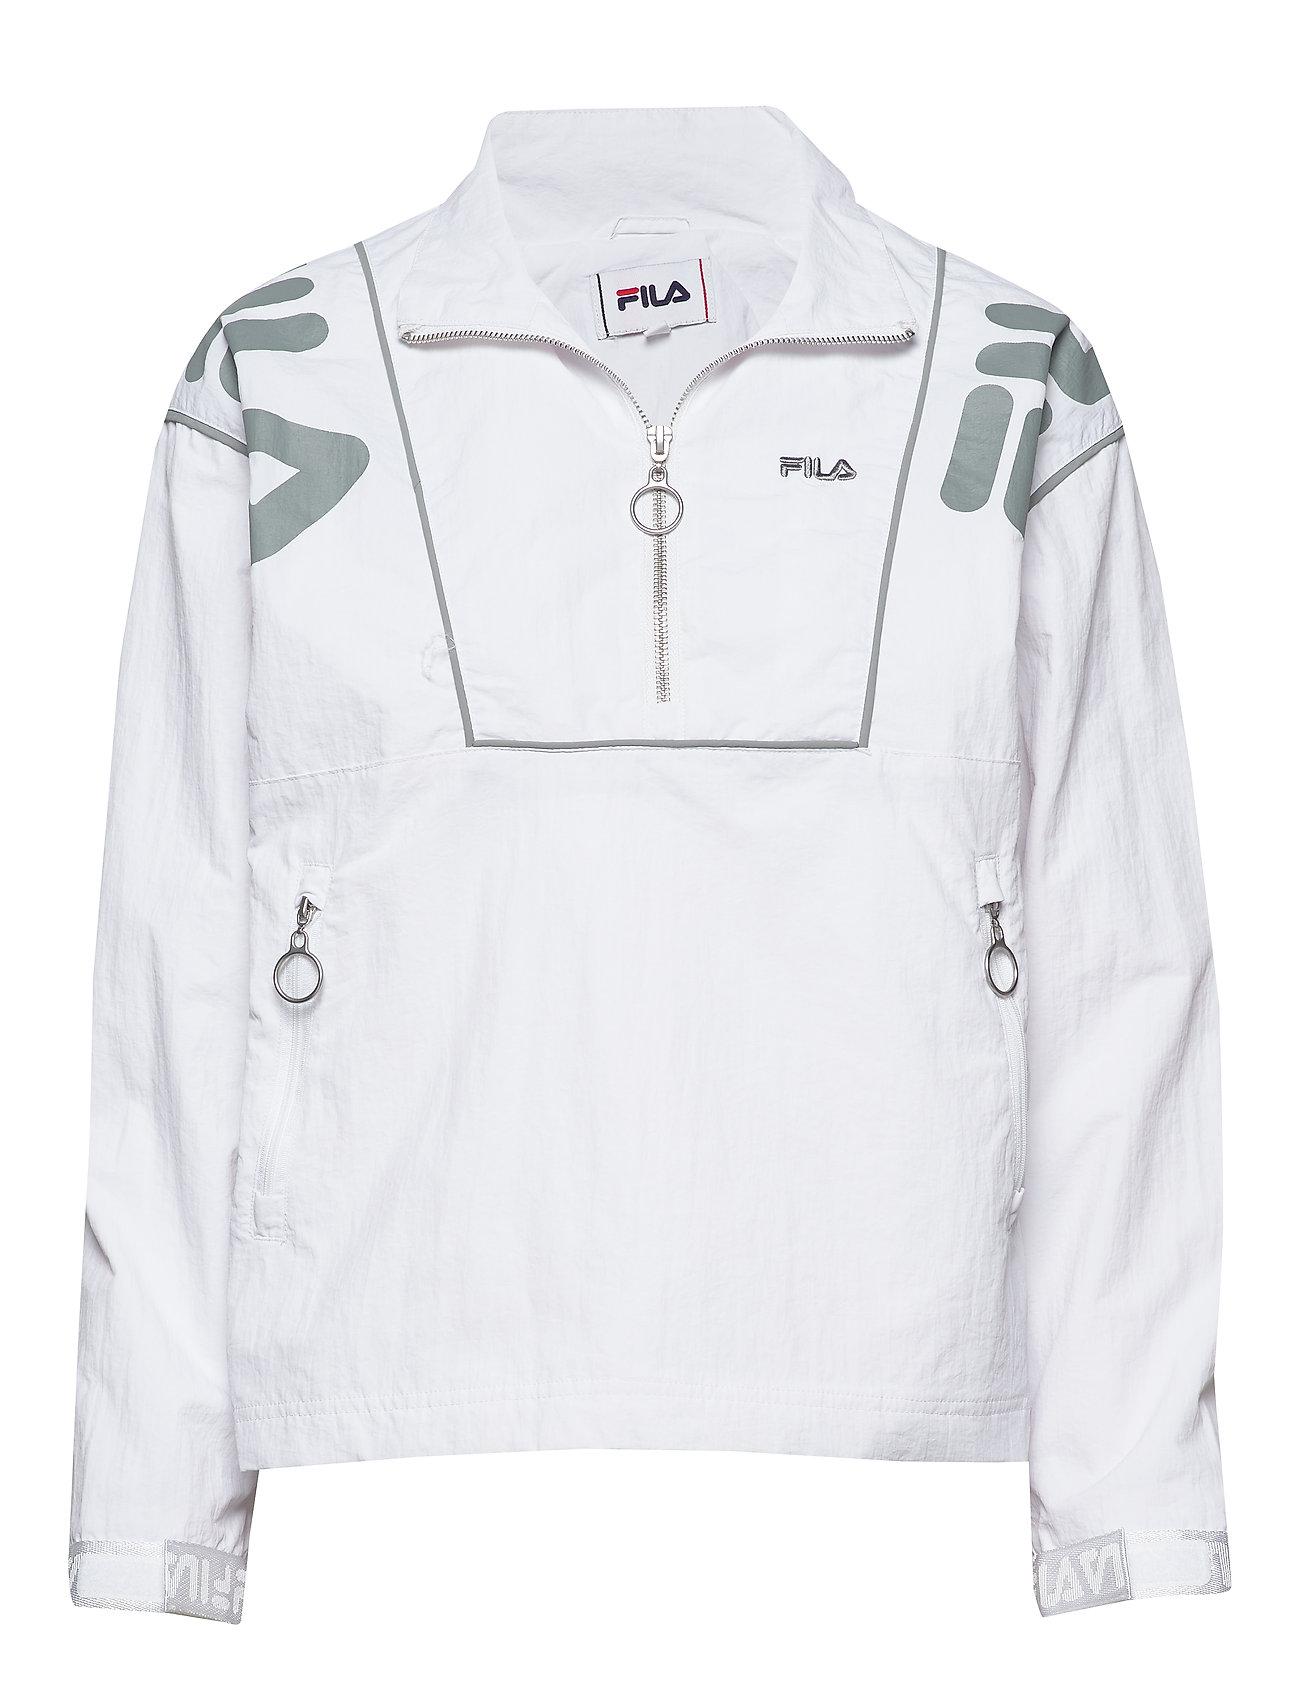 Image of Women Mab Anorak Outerwear Jackets Anoraks Hvid FILA (3362841481)